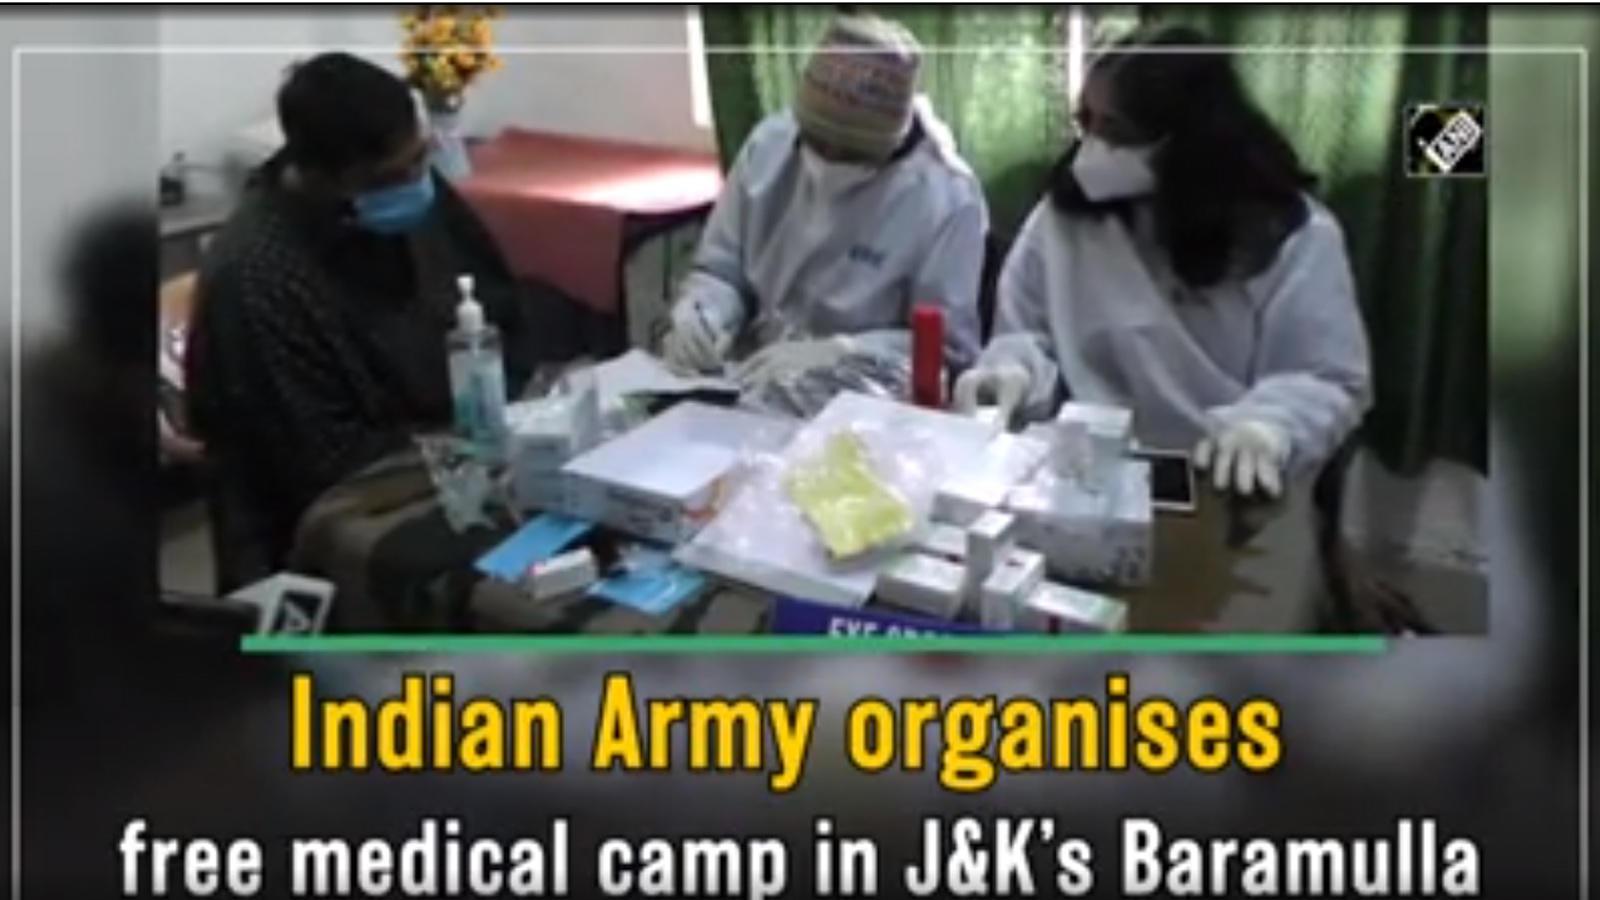 jammu-and-kashmir-indian-army-organises-free-medical-camp-in-baramulla